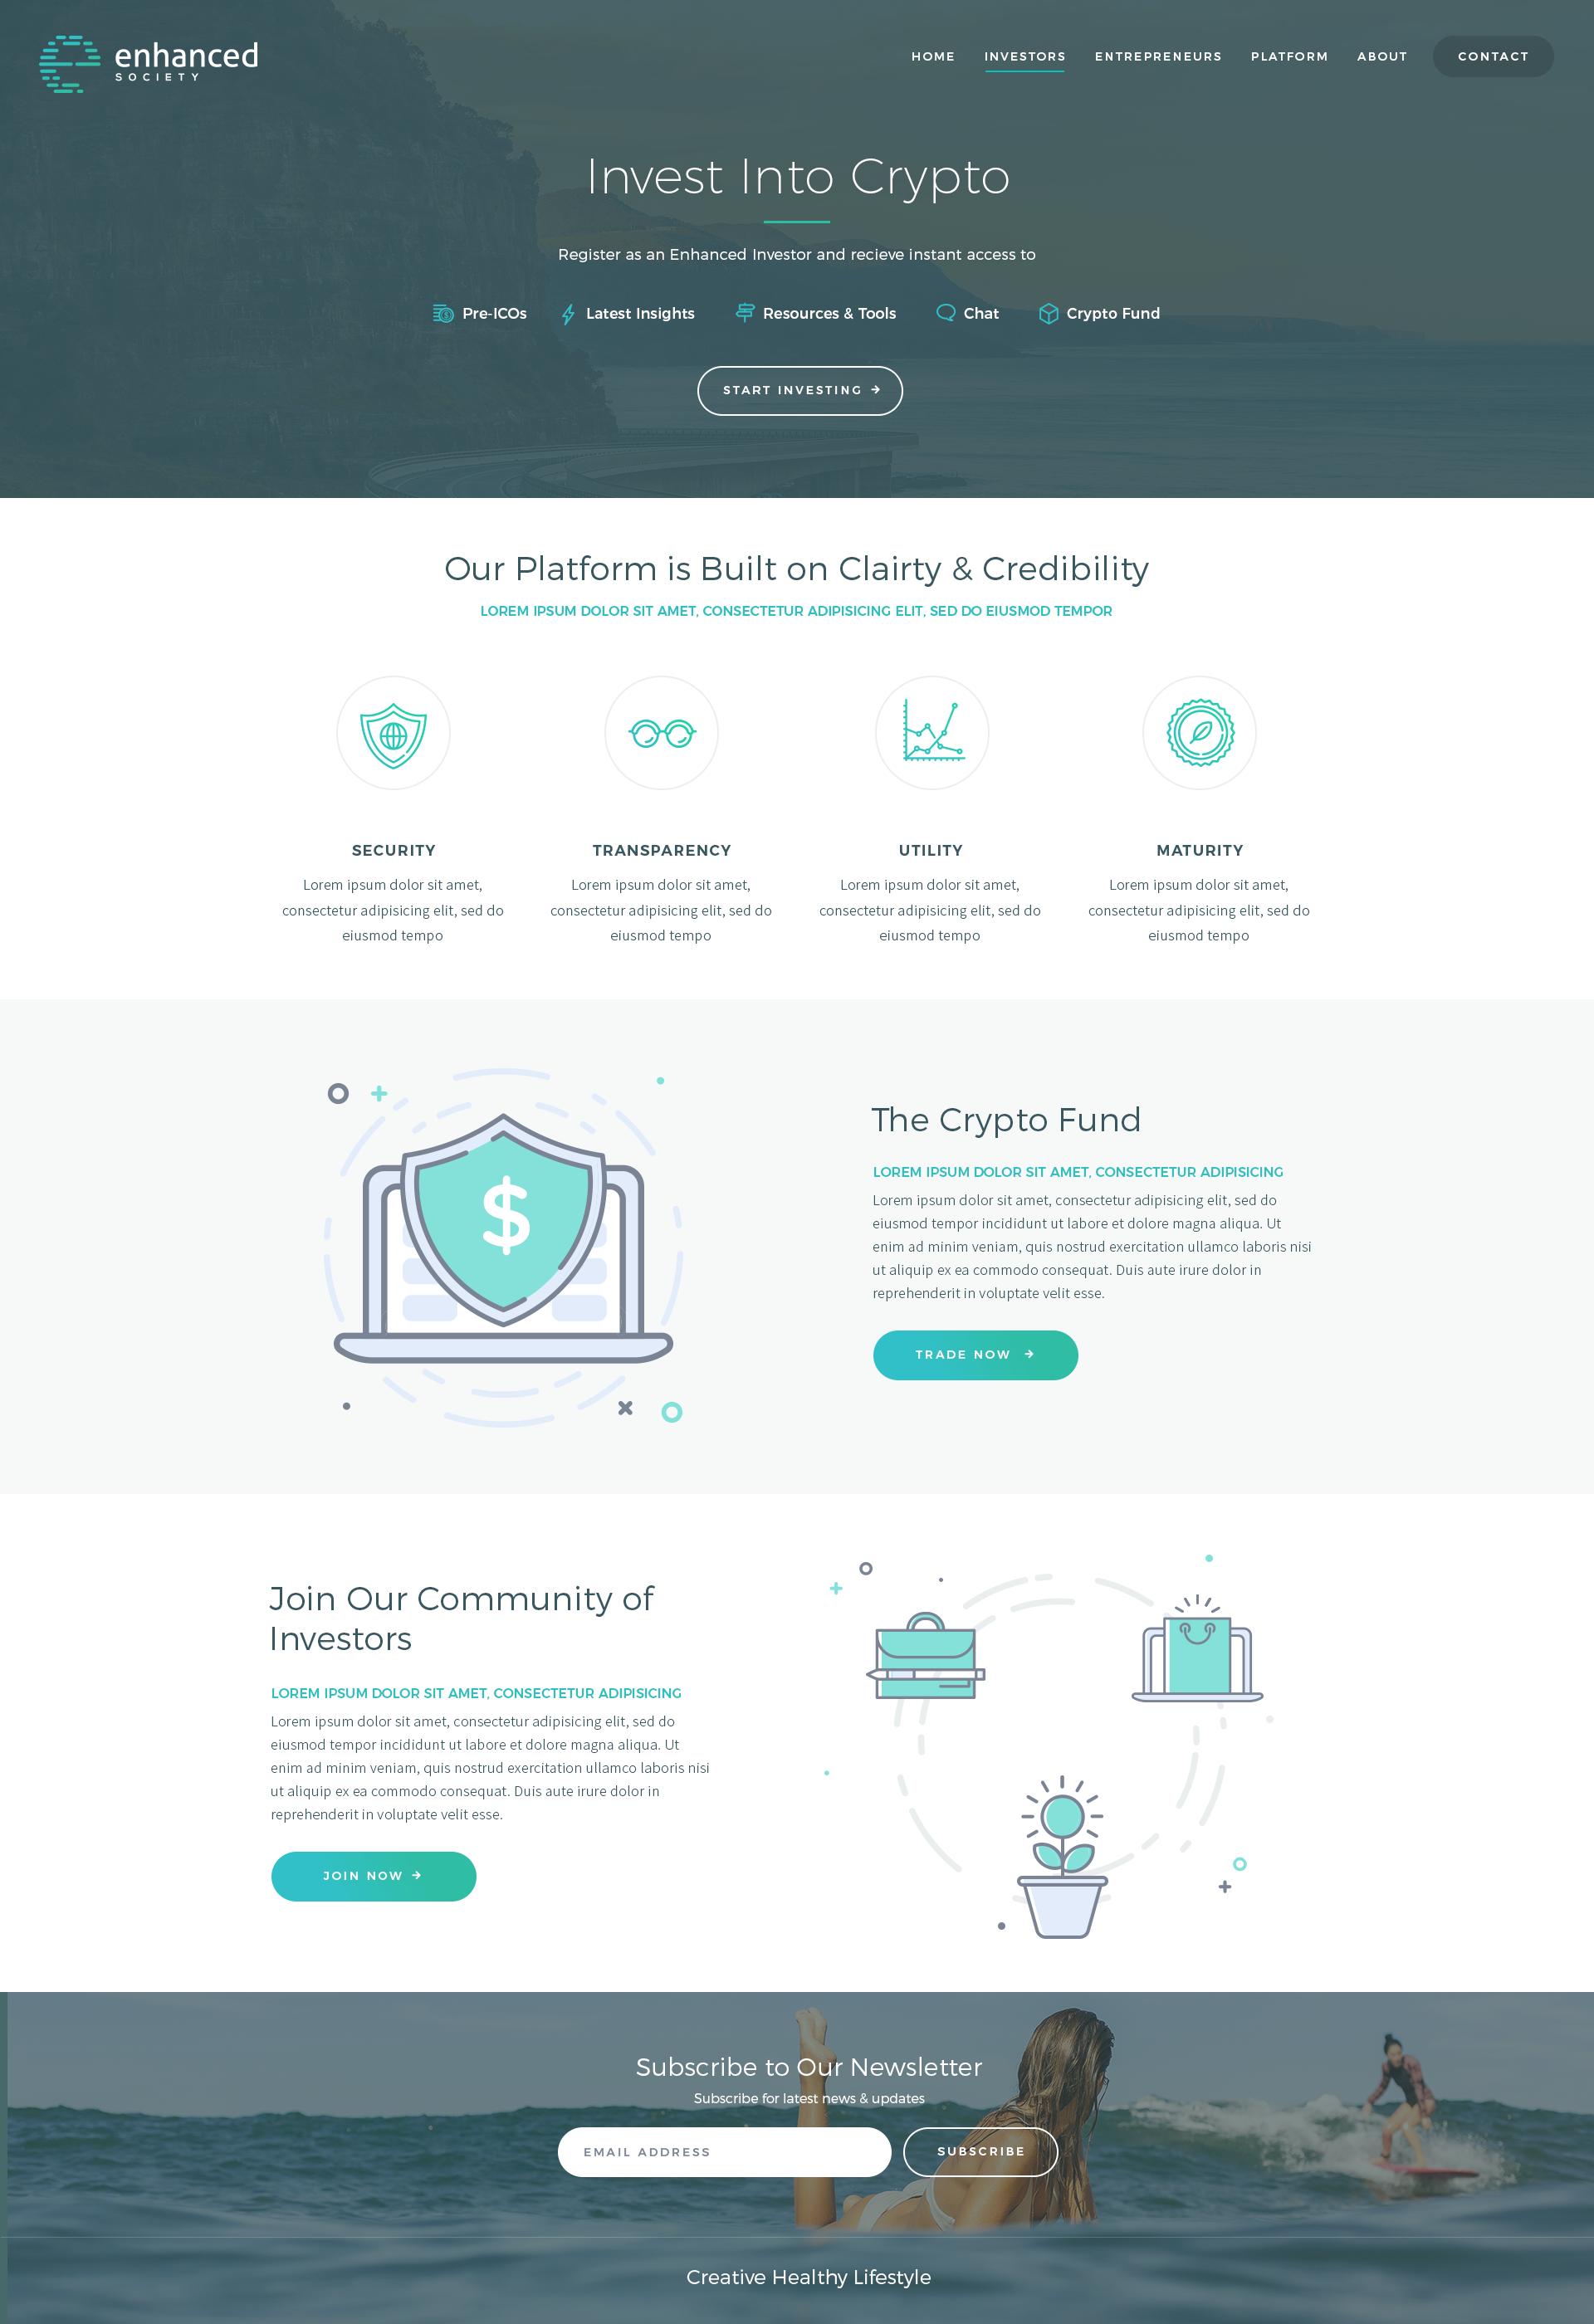 Enhanced Society needs a powerful website design